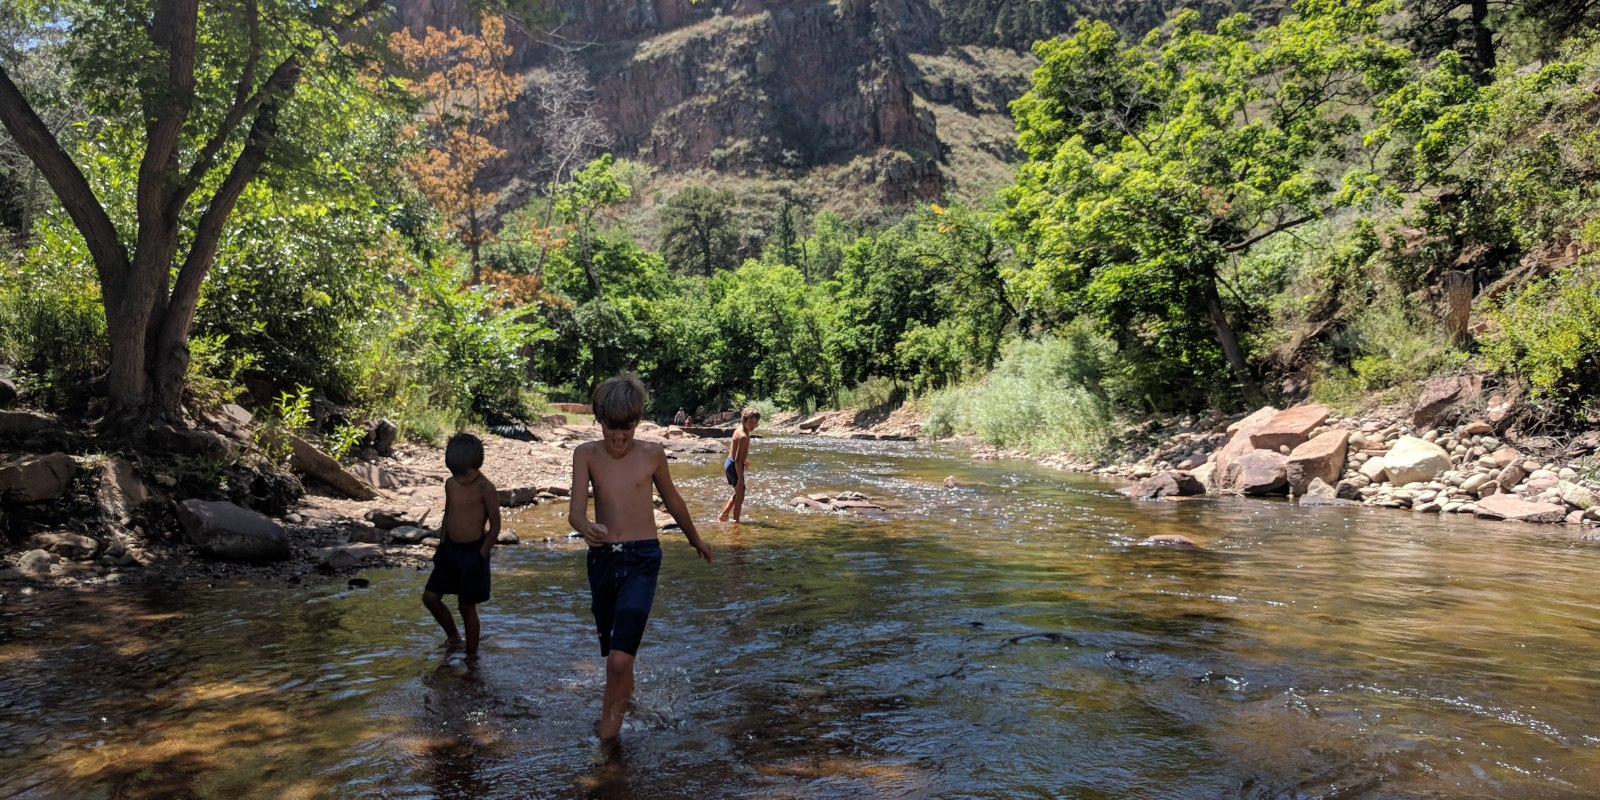 Kids Wading and Splashing in North St. Vrain Creek